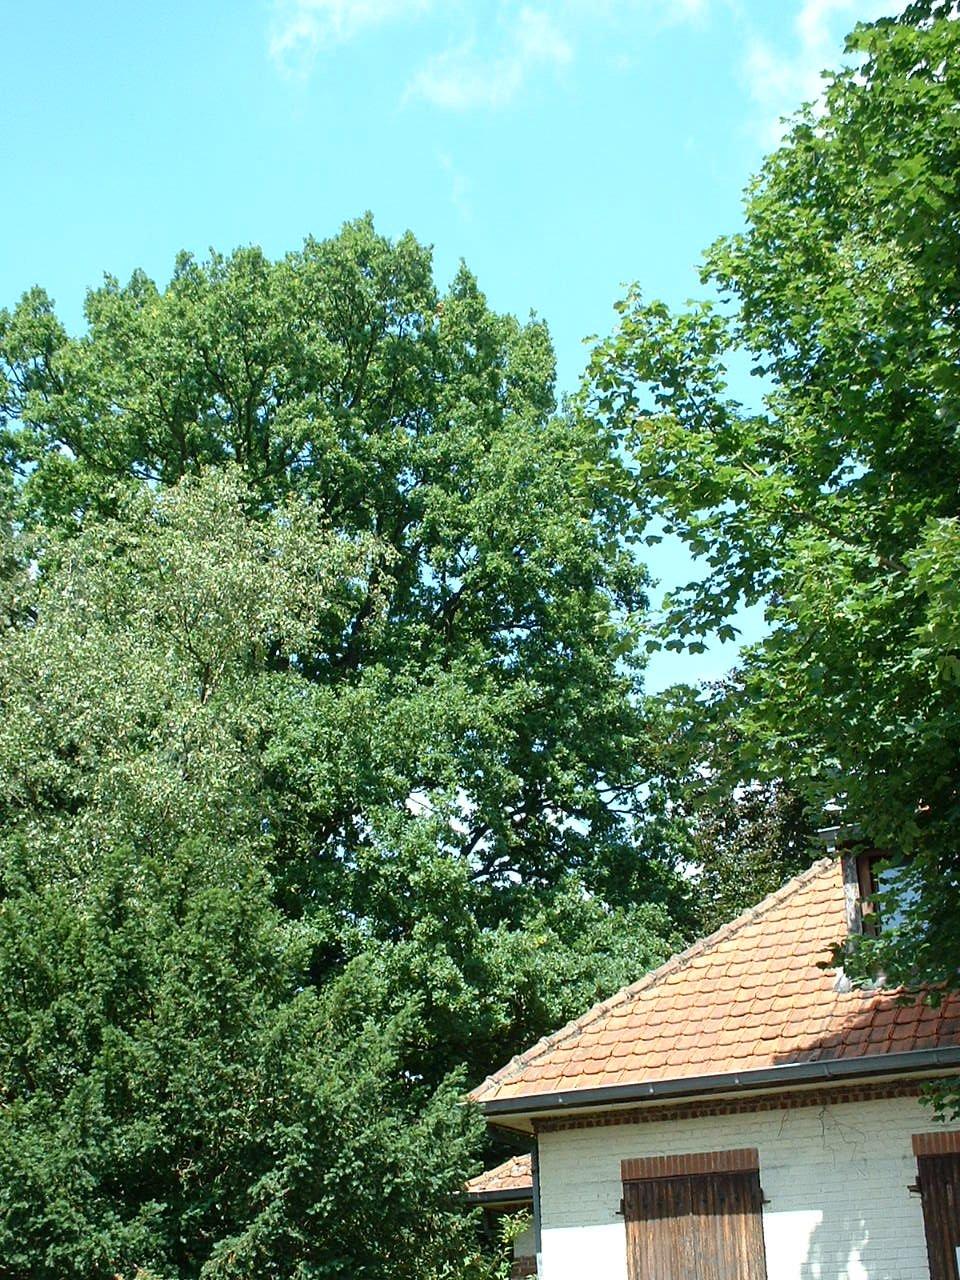 Chêne pédonculé – Watermael-Boitsfort, Avenue Léopold Wiener, 86 –  18 Juillet 2002